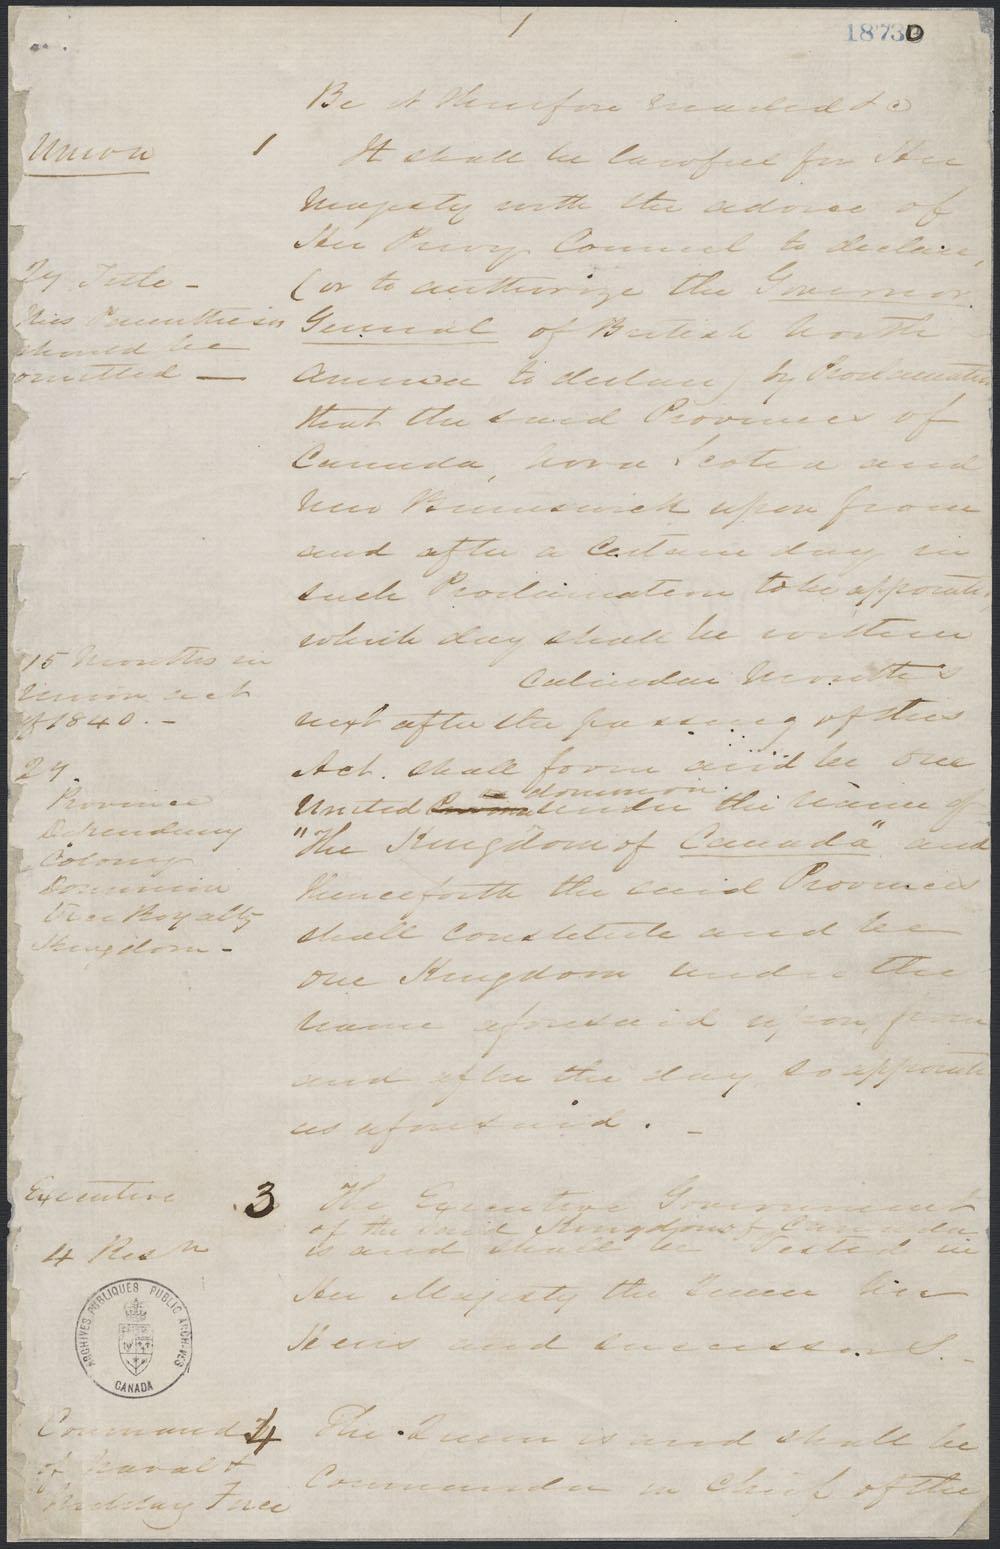 Hand-written historical document.